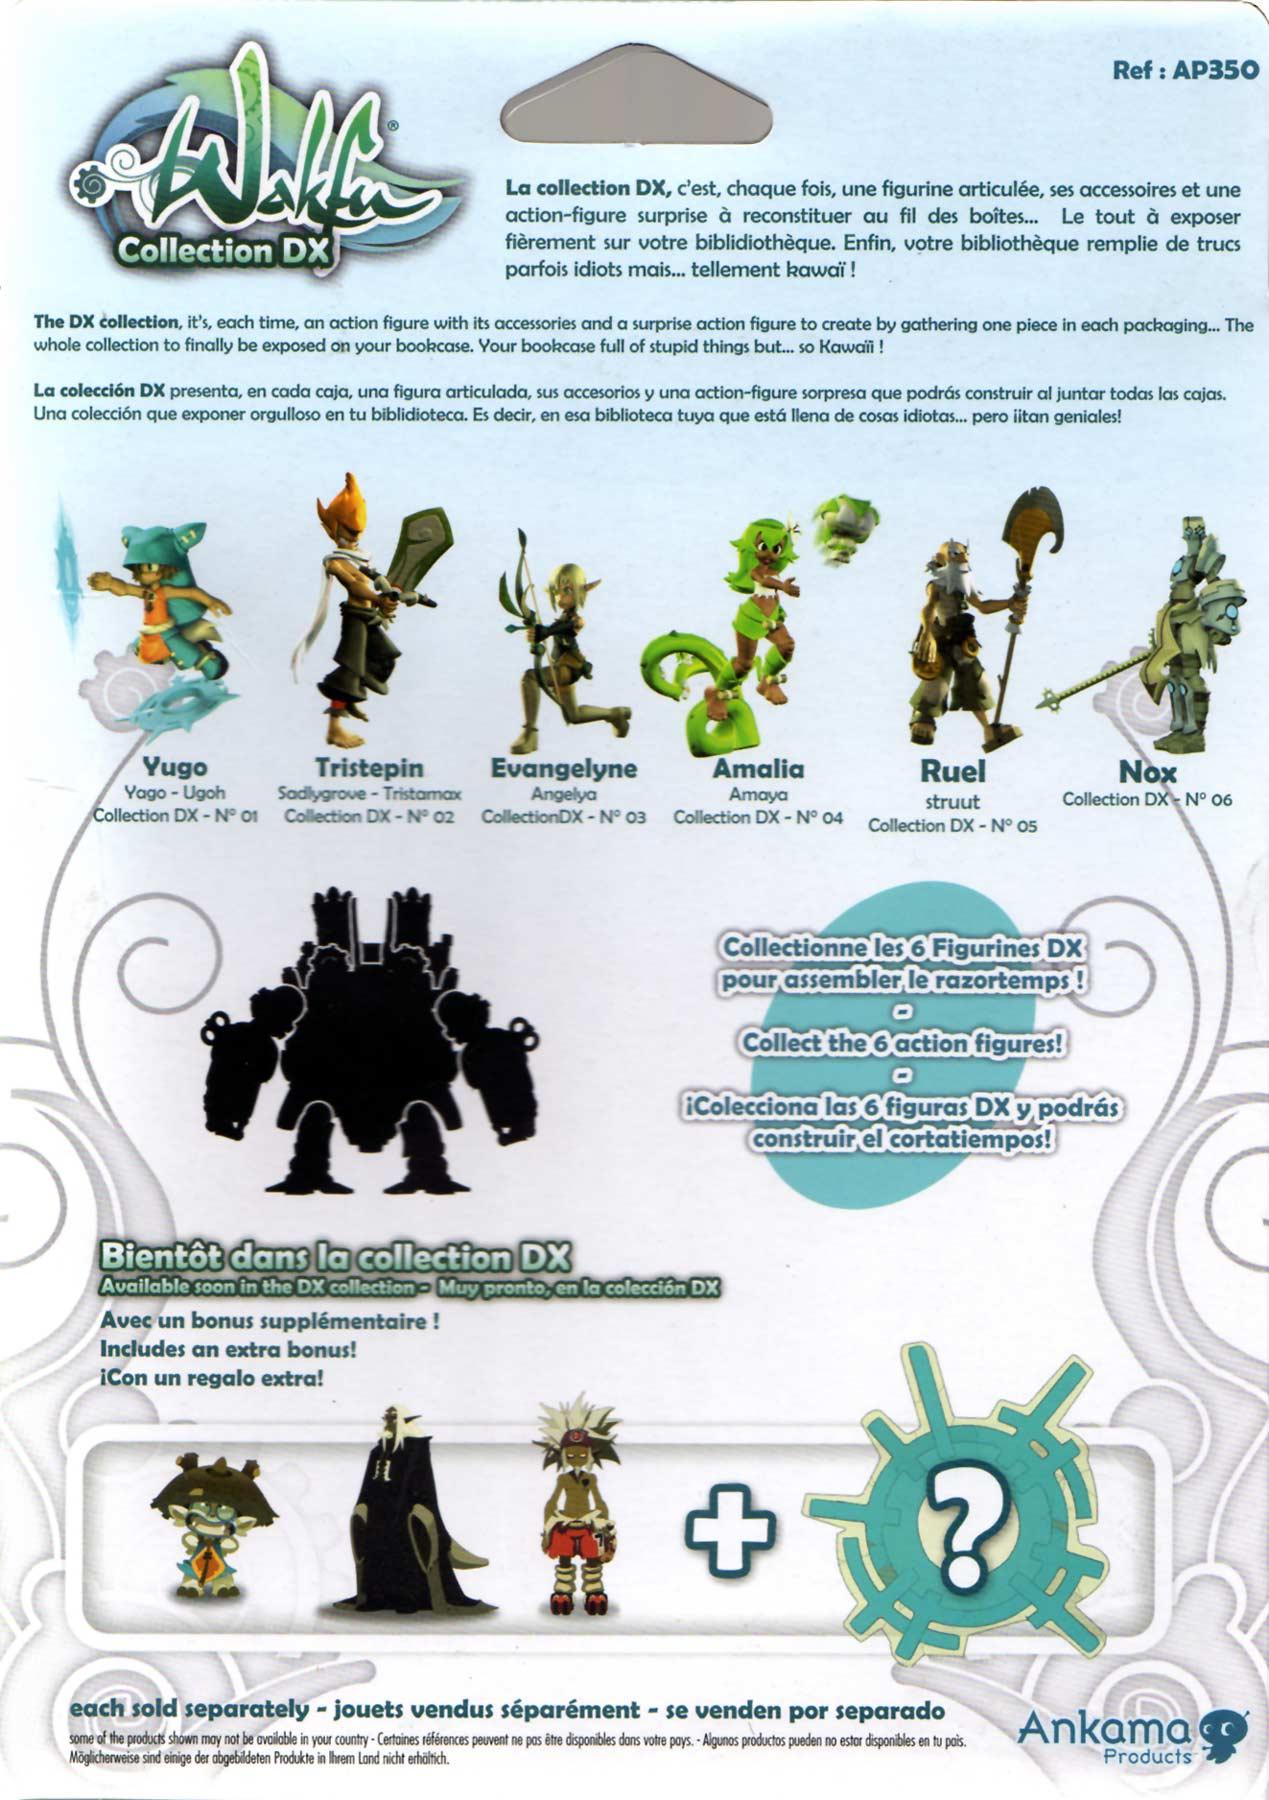 Wakfu action figure nox razortemps dofus jeux Ankama dx 6 new in box